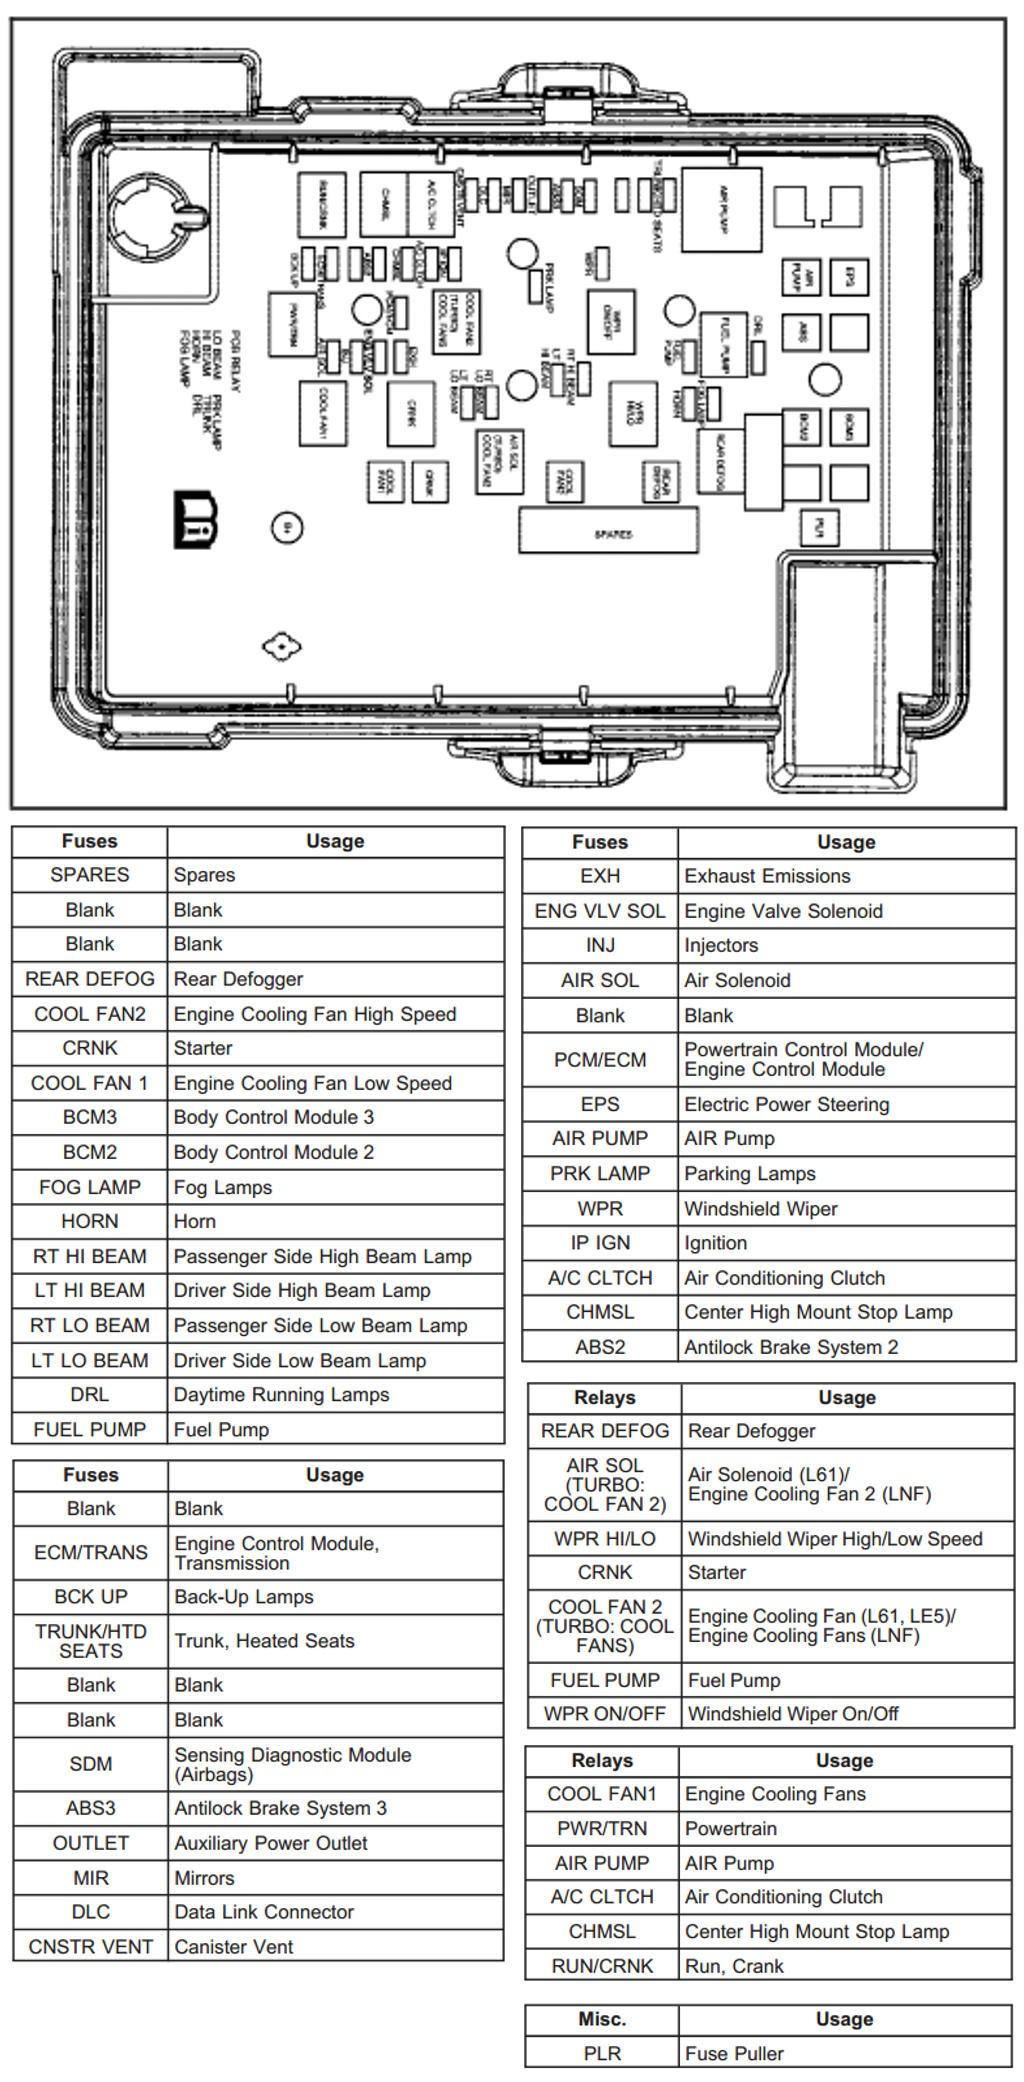 2005 chevrolet cobalt radio wiring harness